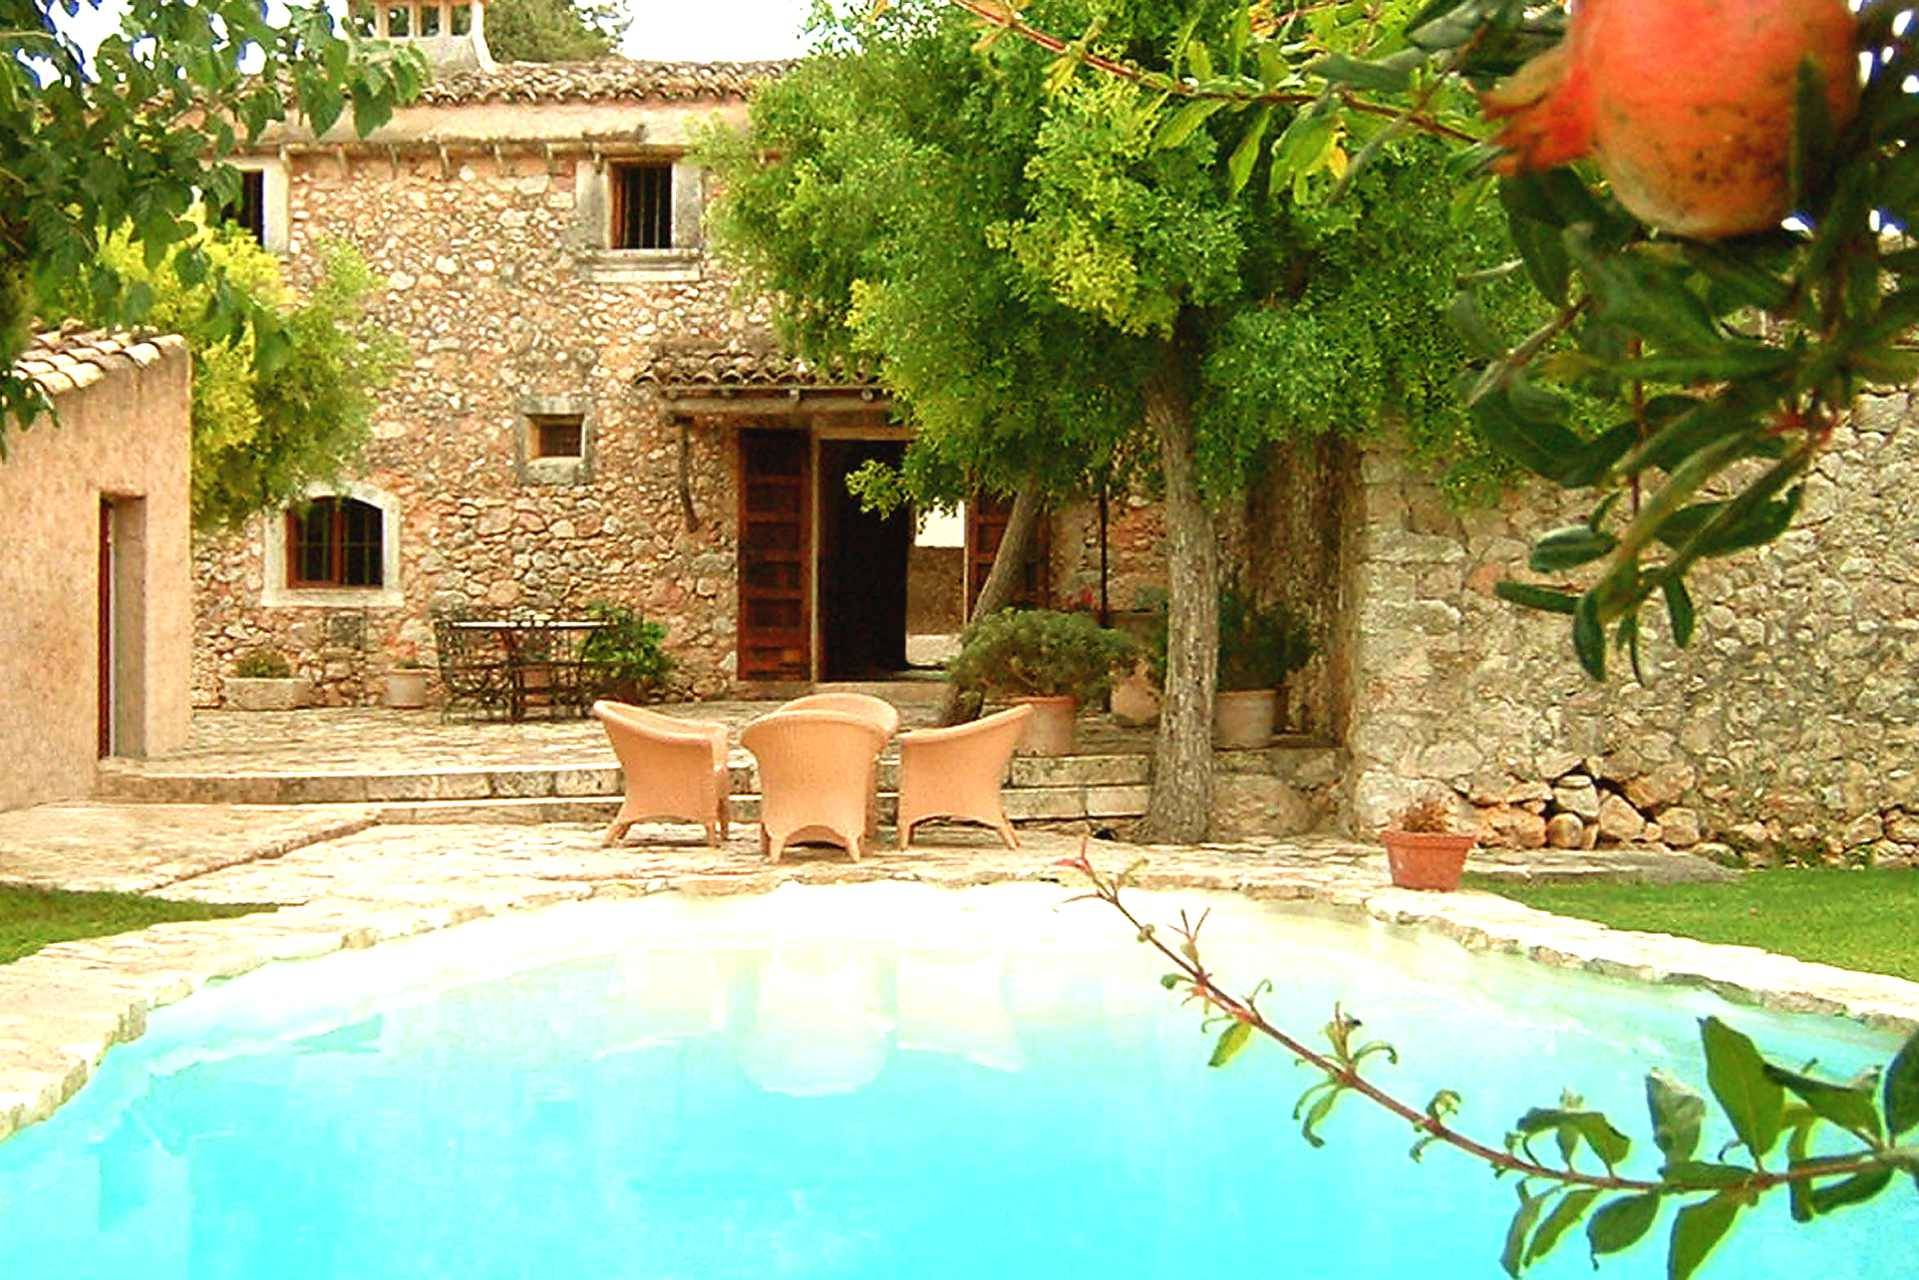 01-06 Charming Holiday Home Mallorca north Bild 1